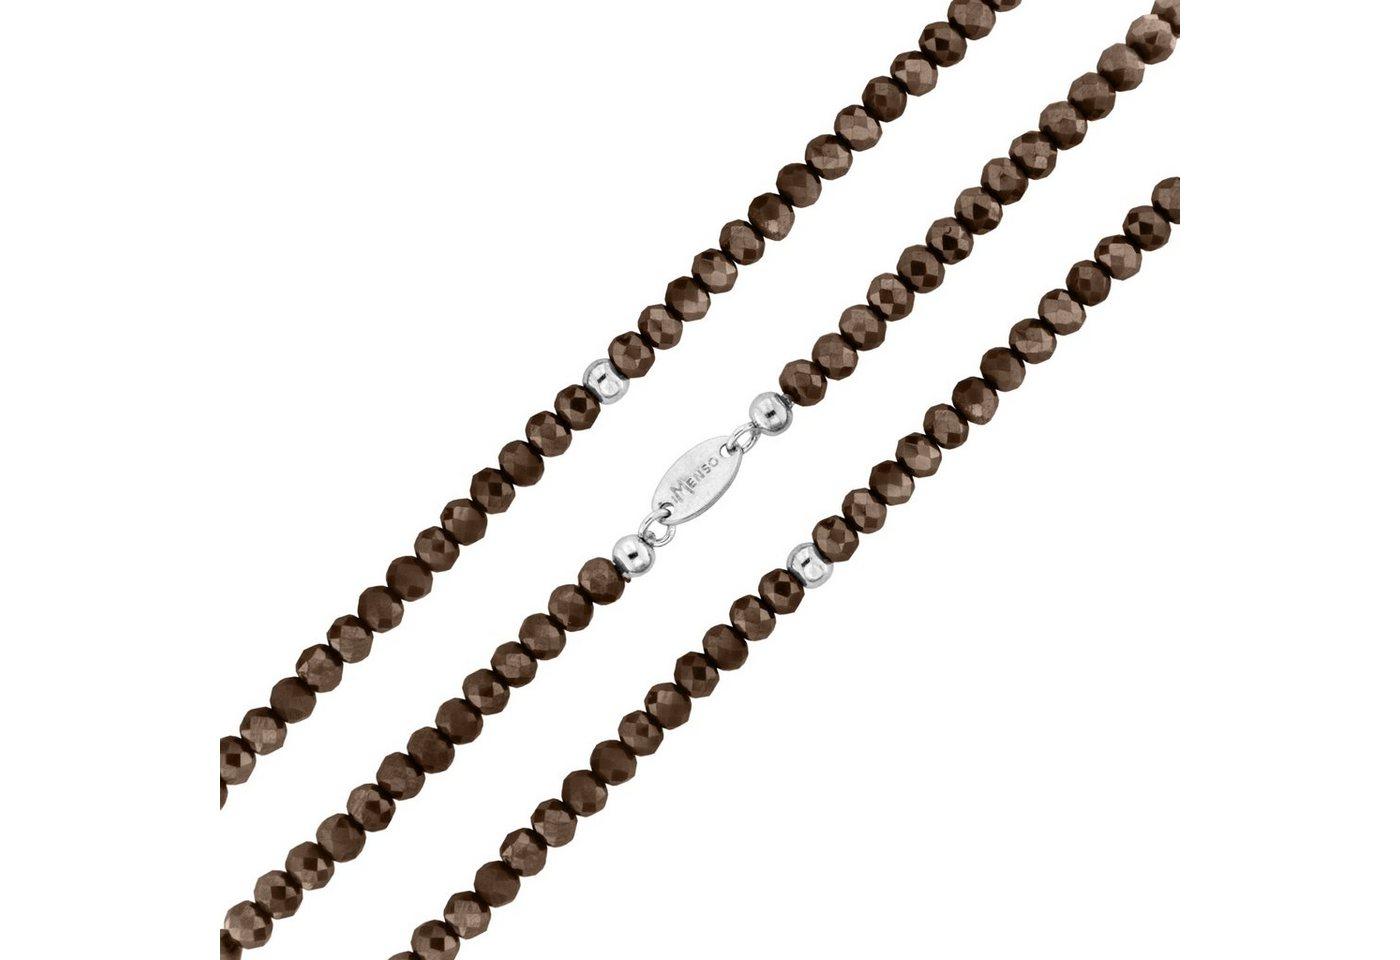 MY iMenso Wickelarmband mit facettierten Kristallen   Schmuck > Armbänder > Wickelarmbänder   Braun   MY iMenso